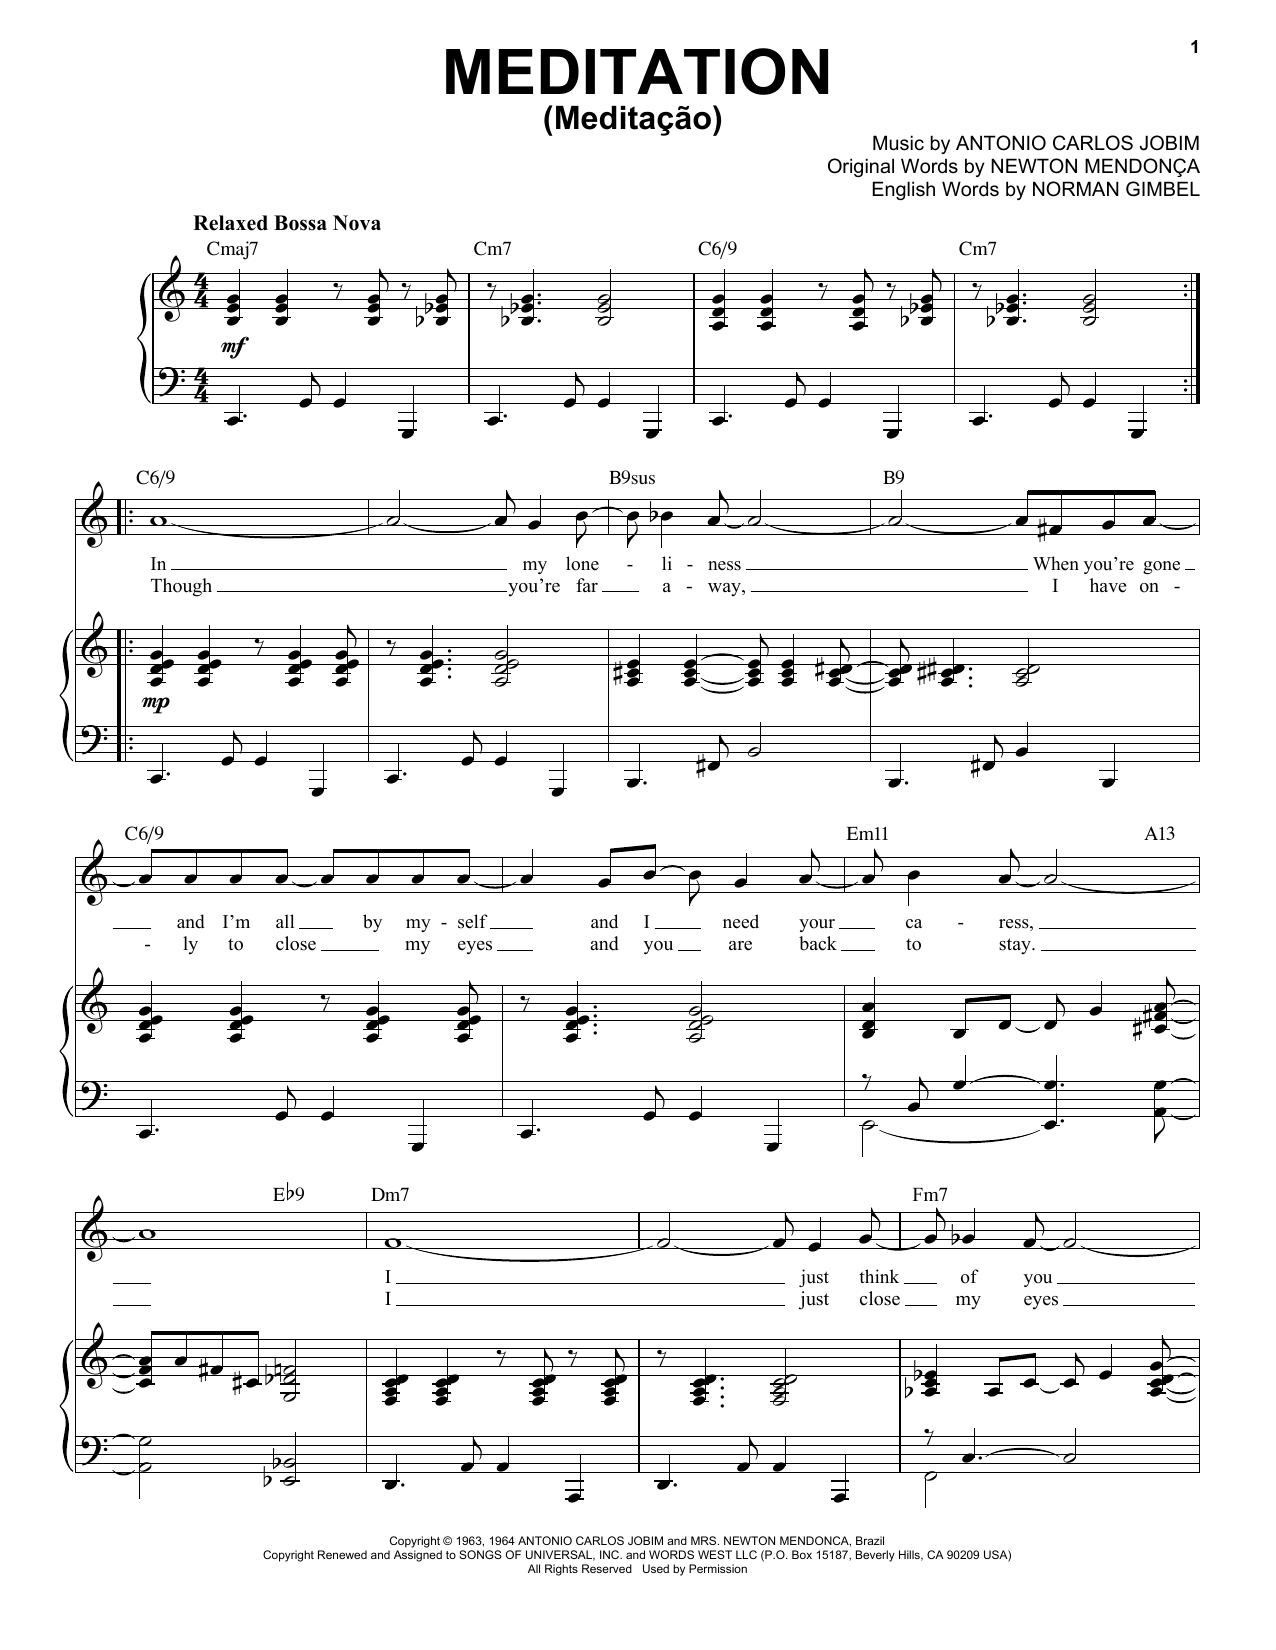 Meditation (Meditacao) [Jazz version] (arr. Brent Edstrom) (Piano & Vocal)